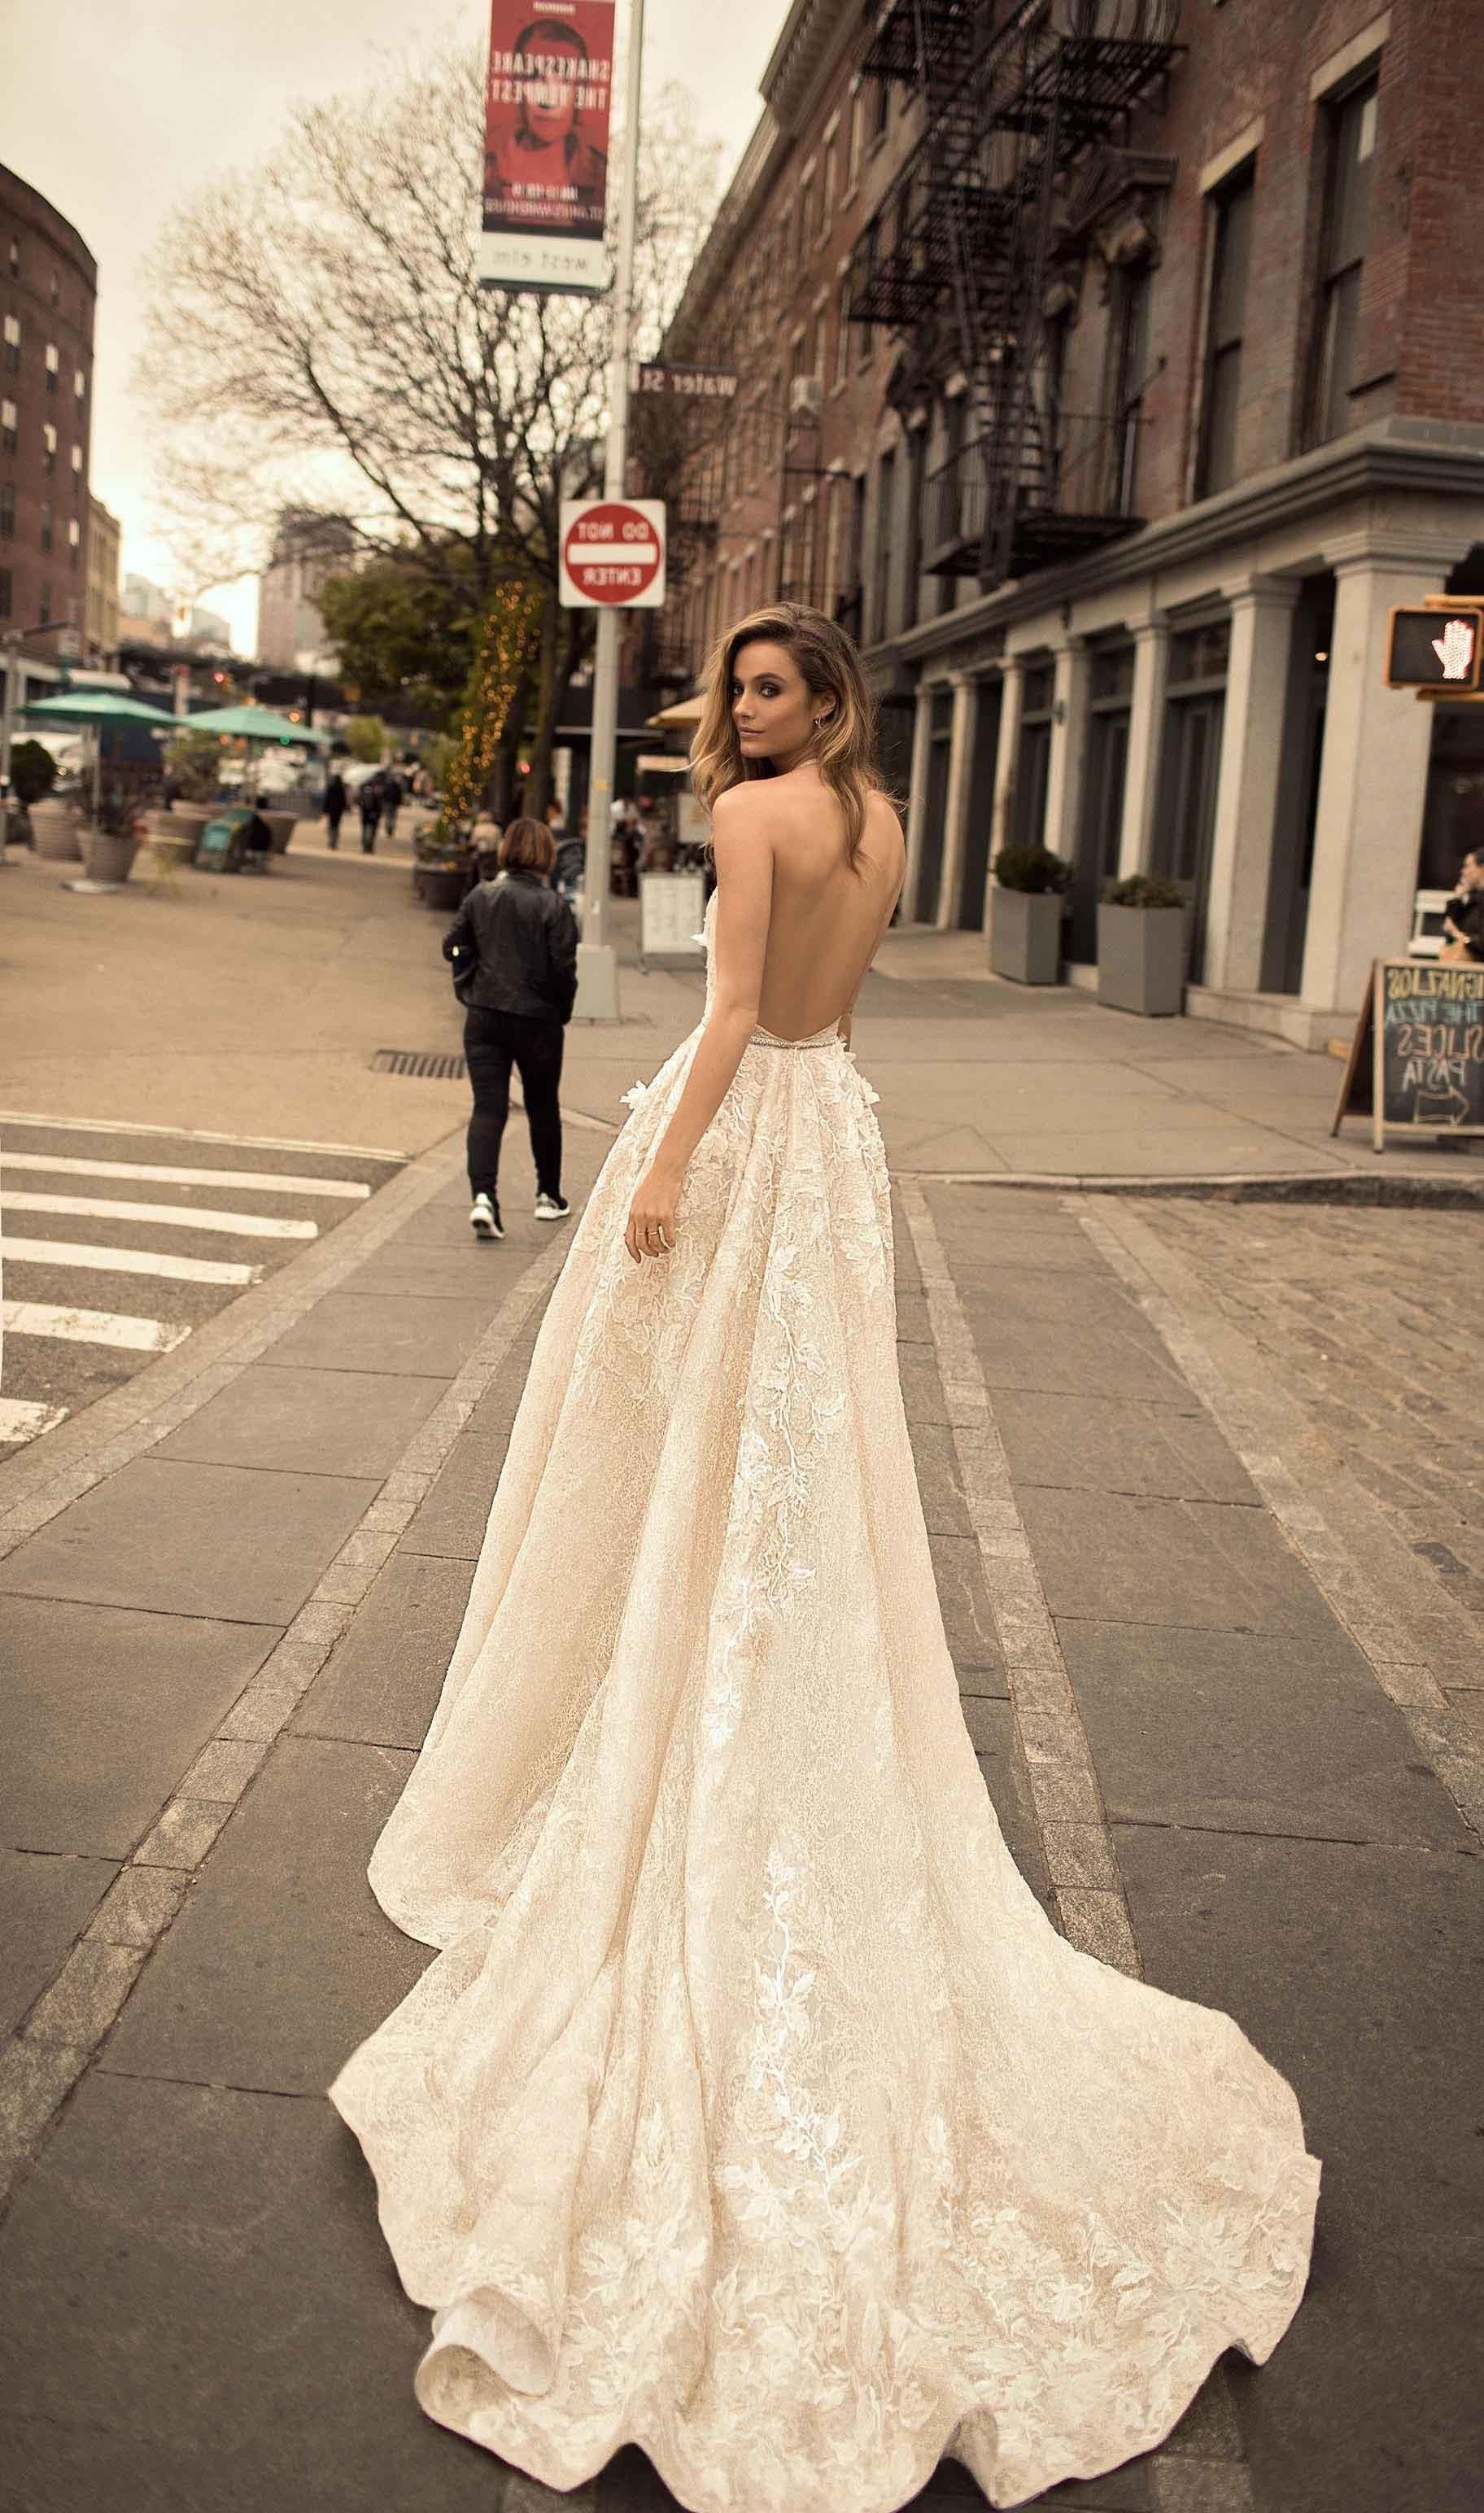 Design Bridesmaid Dresses Hijab Drdp Wedding Ideas White and Gold Wedding Dress the Newest